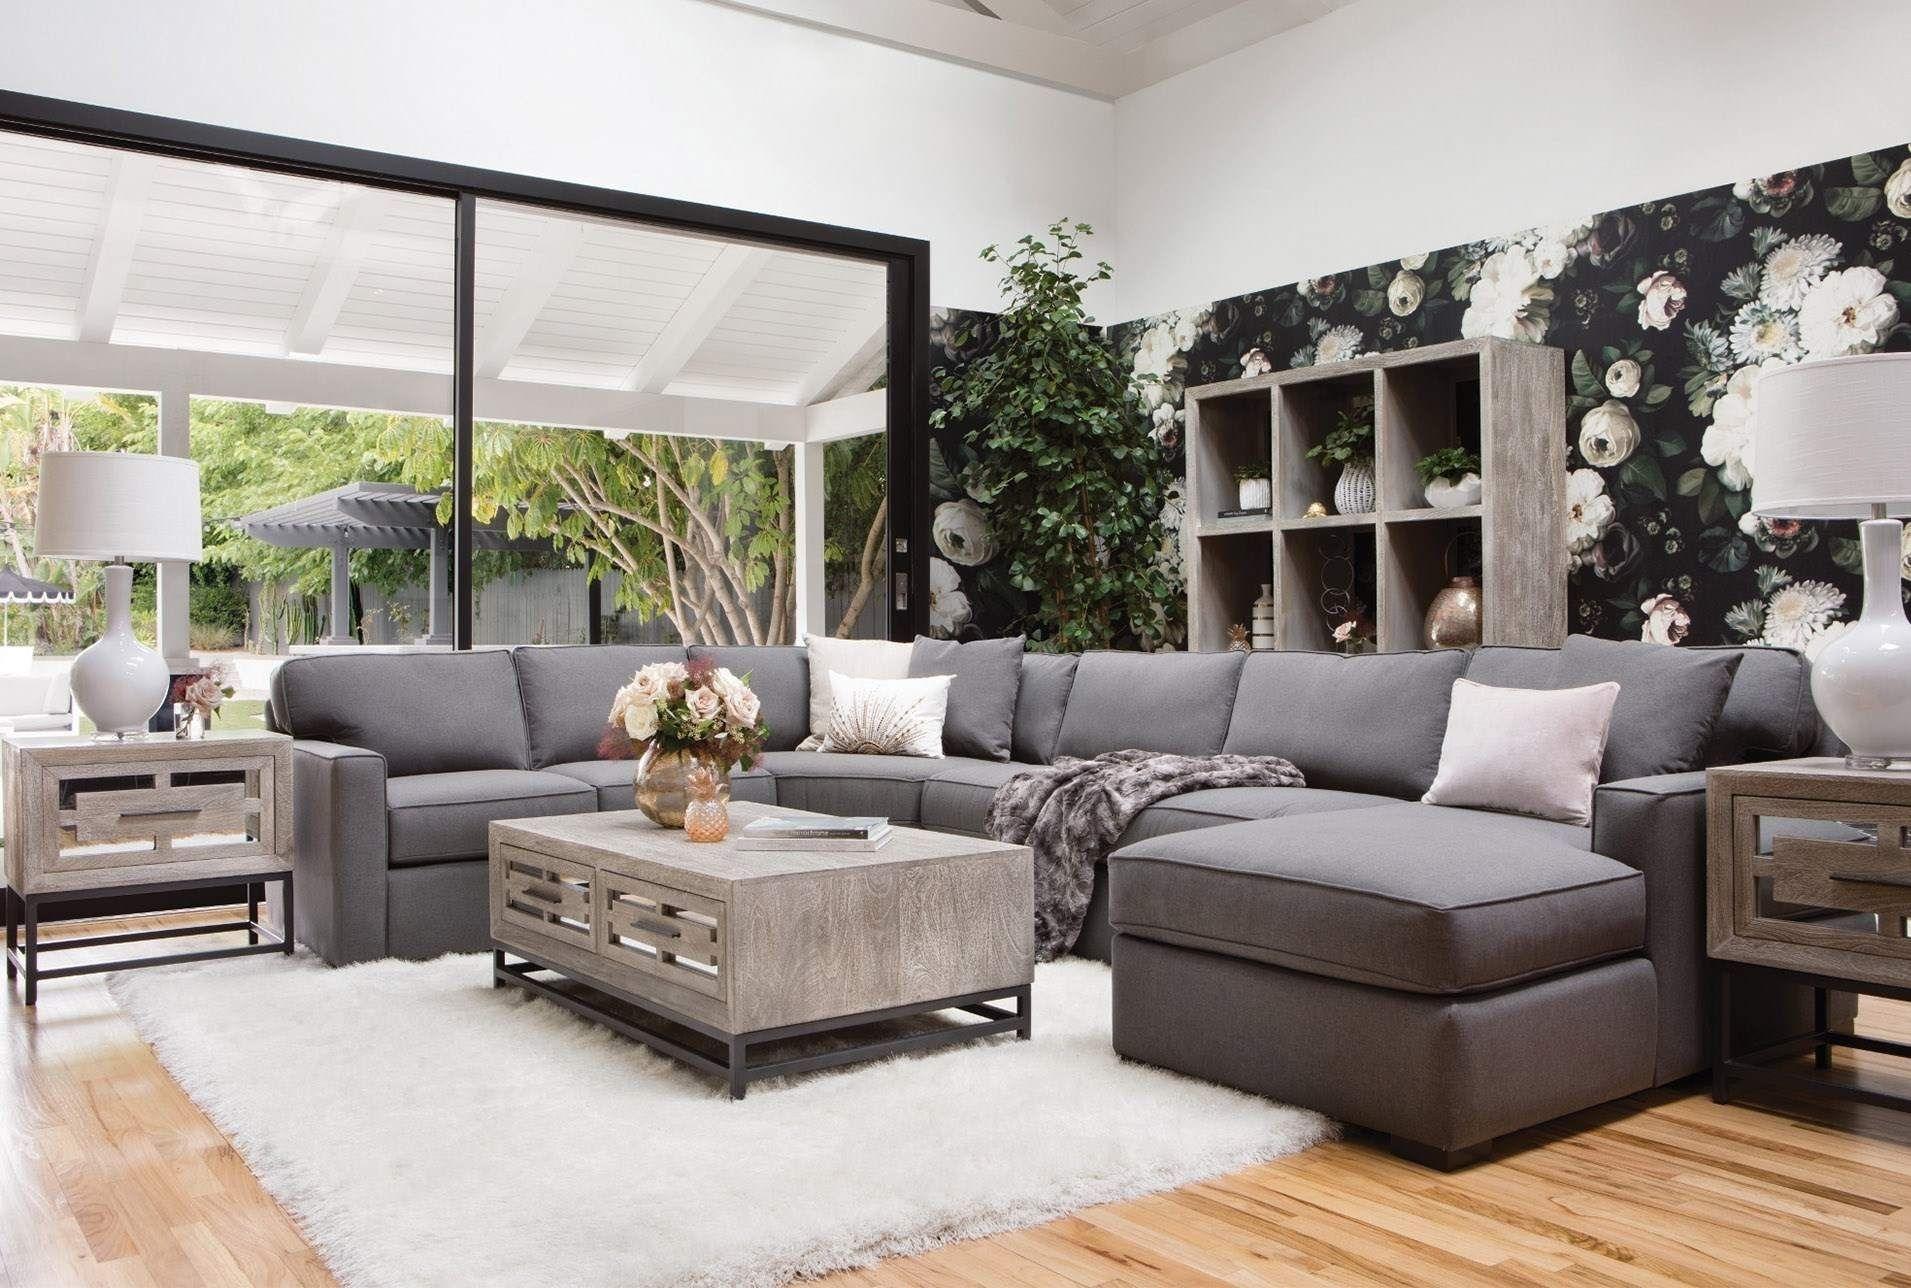 Alder 4 Piece Sectional, Sofas | Pinterest | Living Room Ideas, Room Pertaining To Alder 4 Piece Sectionals (Image 7 of 25)